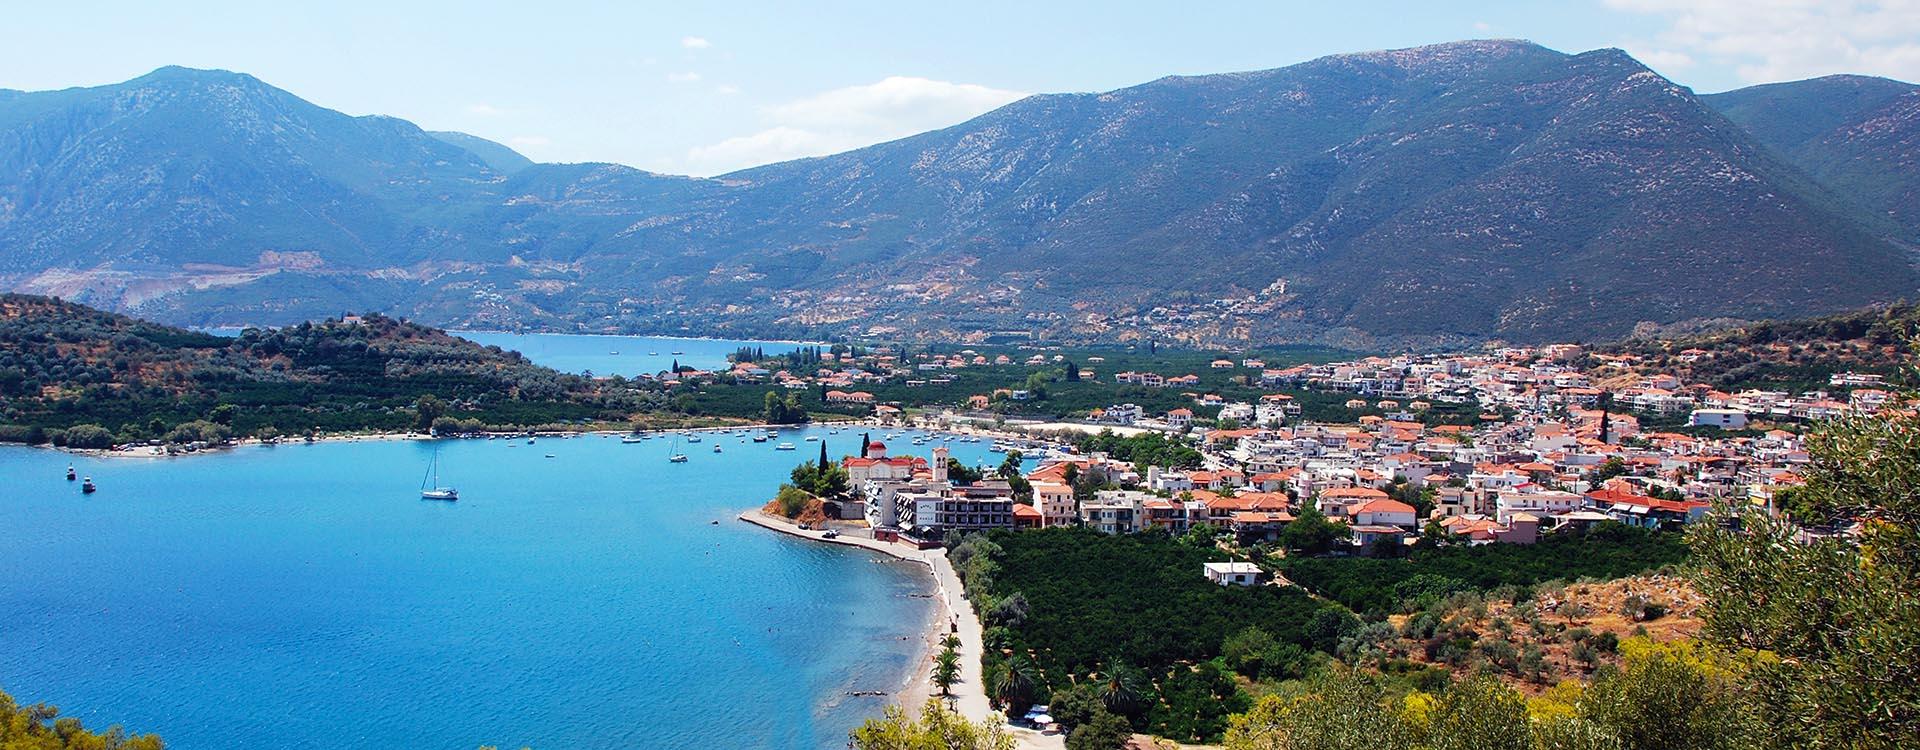 About Epidavros - Christina Hotel